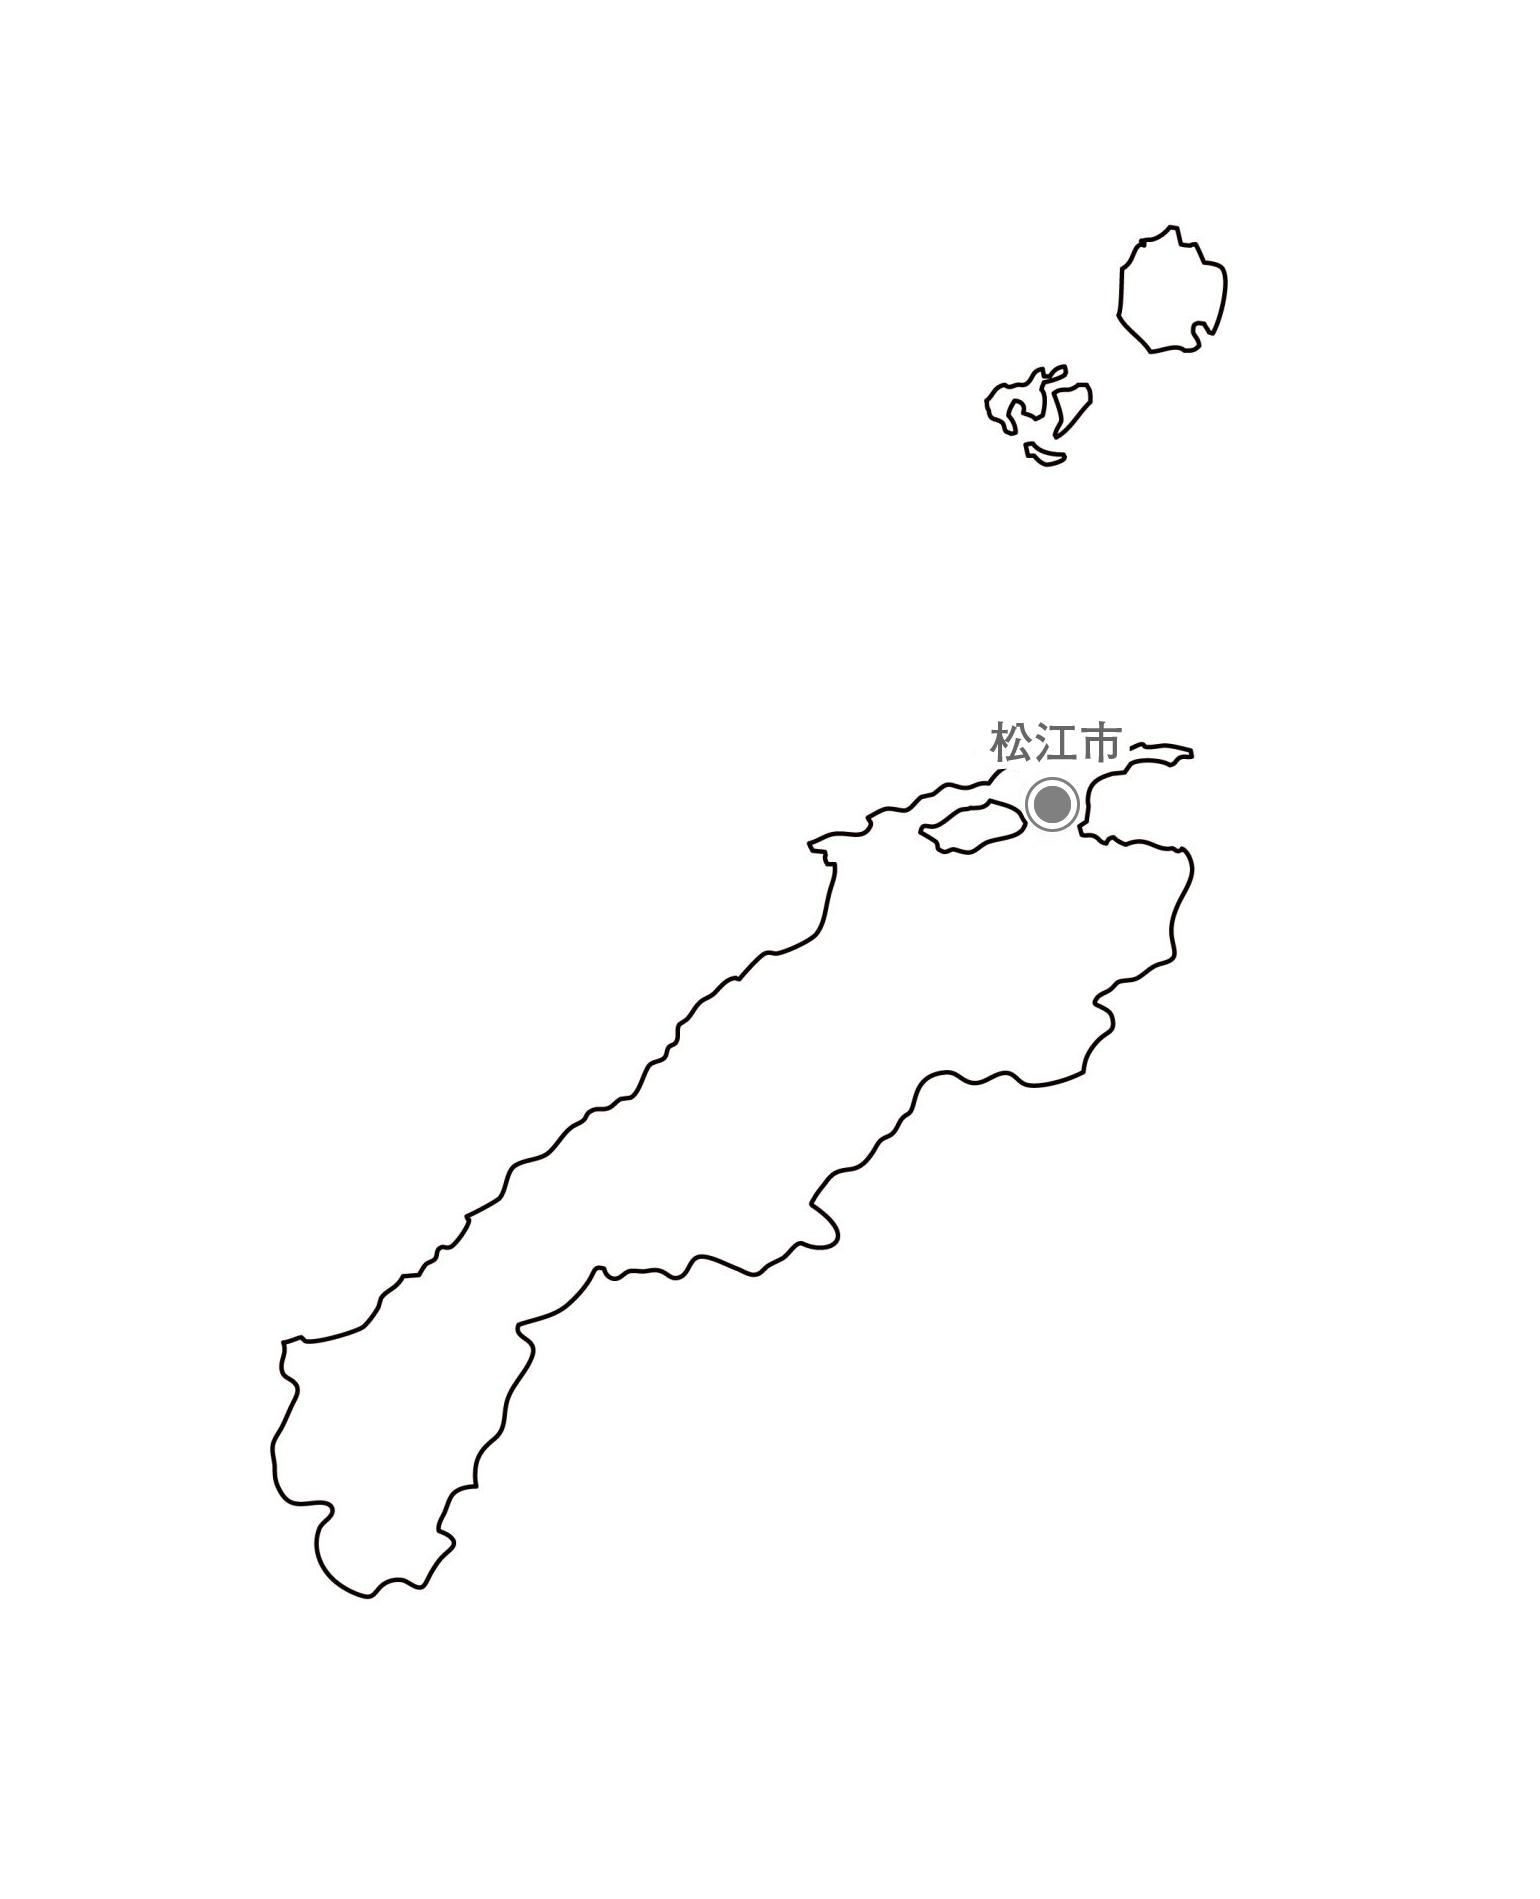 [白地図]島根県・都道府県名・県庁所在地あり